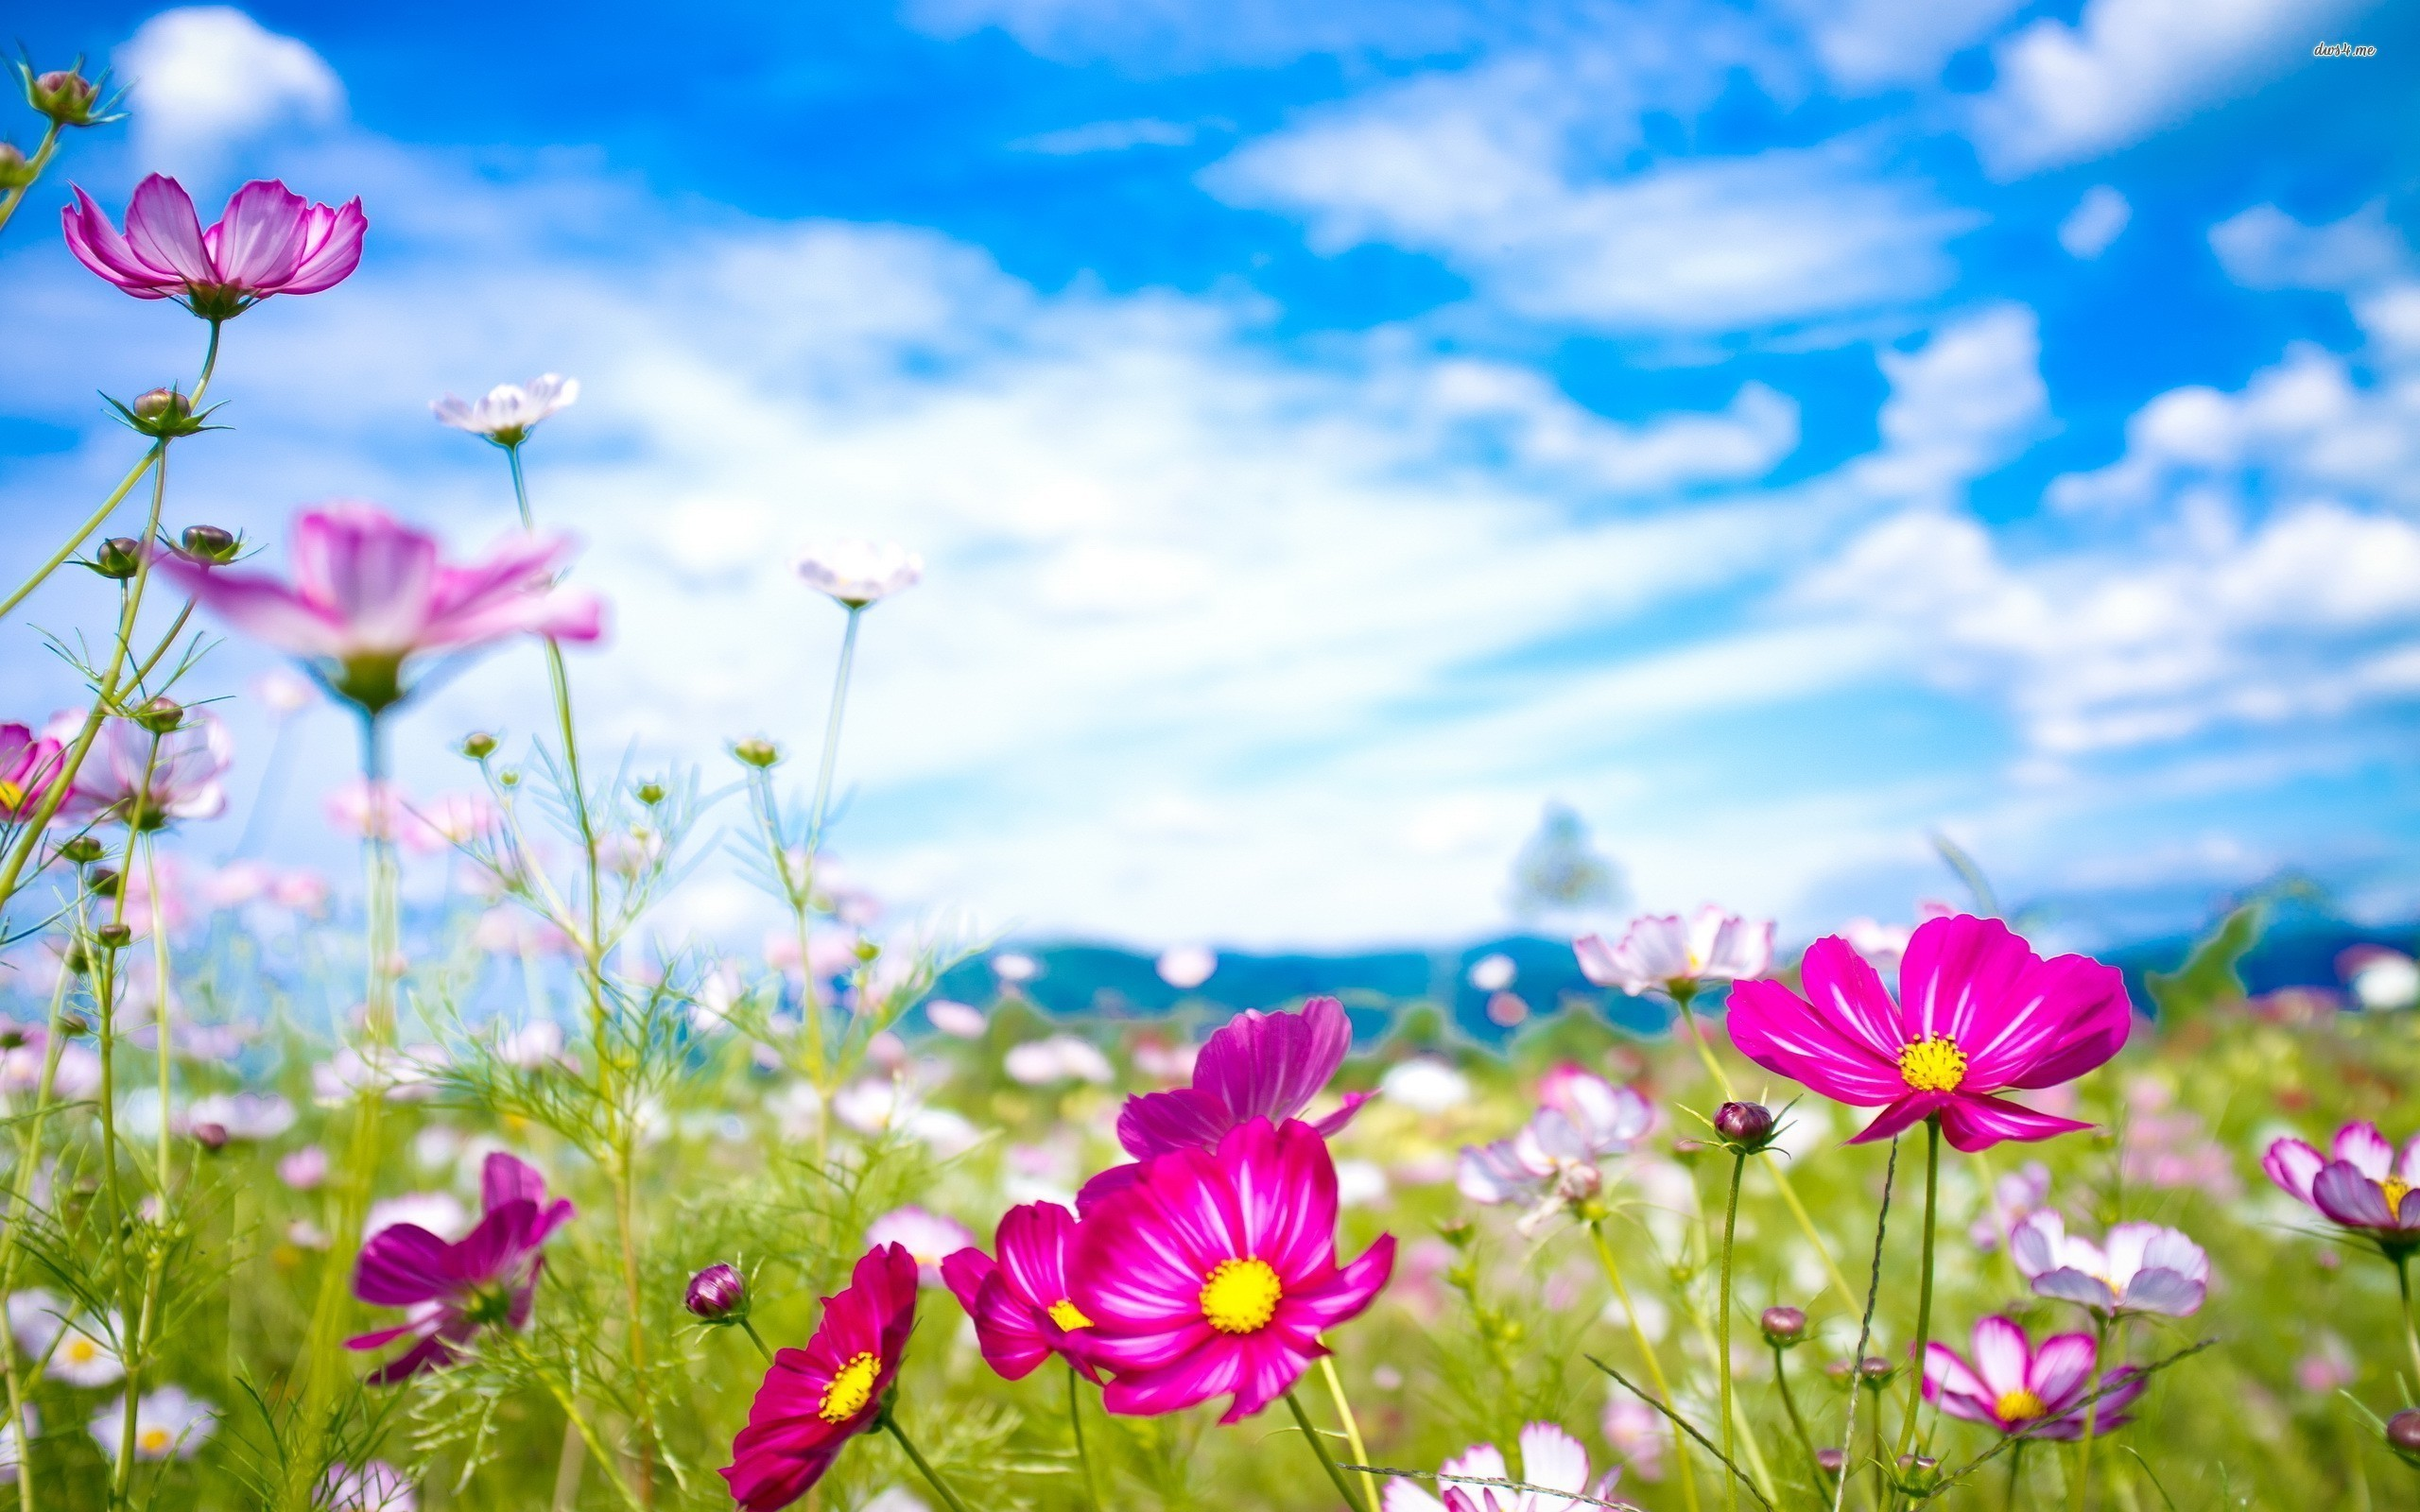 Res: 2560x1600, 1920x1200 flower backgrounds | Cosmos flowers Wallpaper | High Quality  Wallpapers, Wallpaper Desktop .